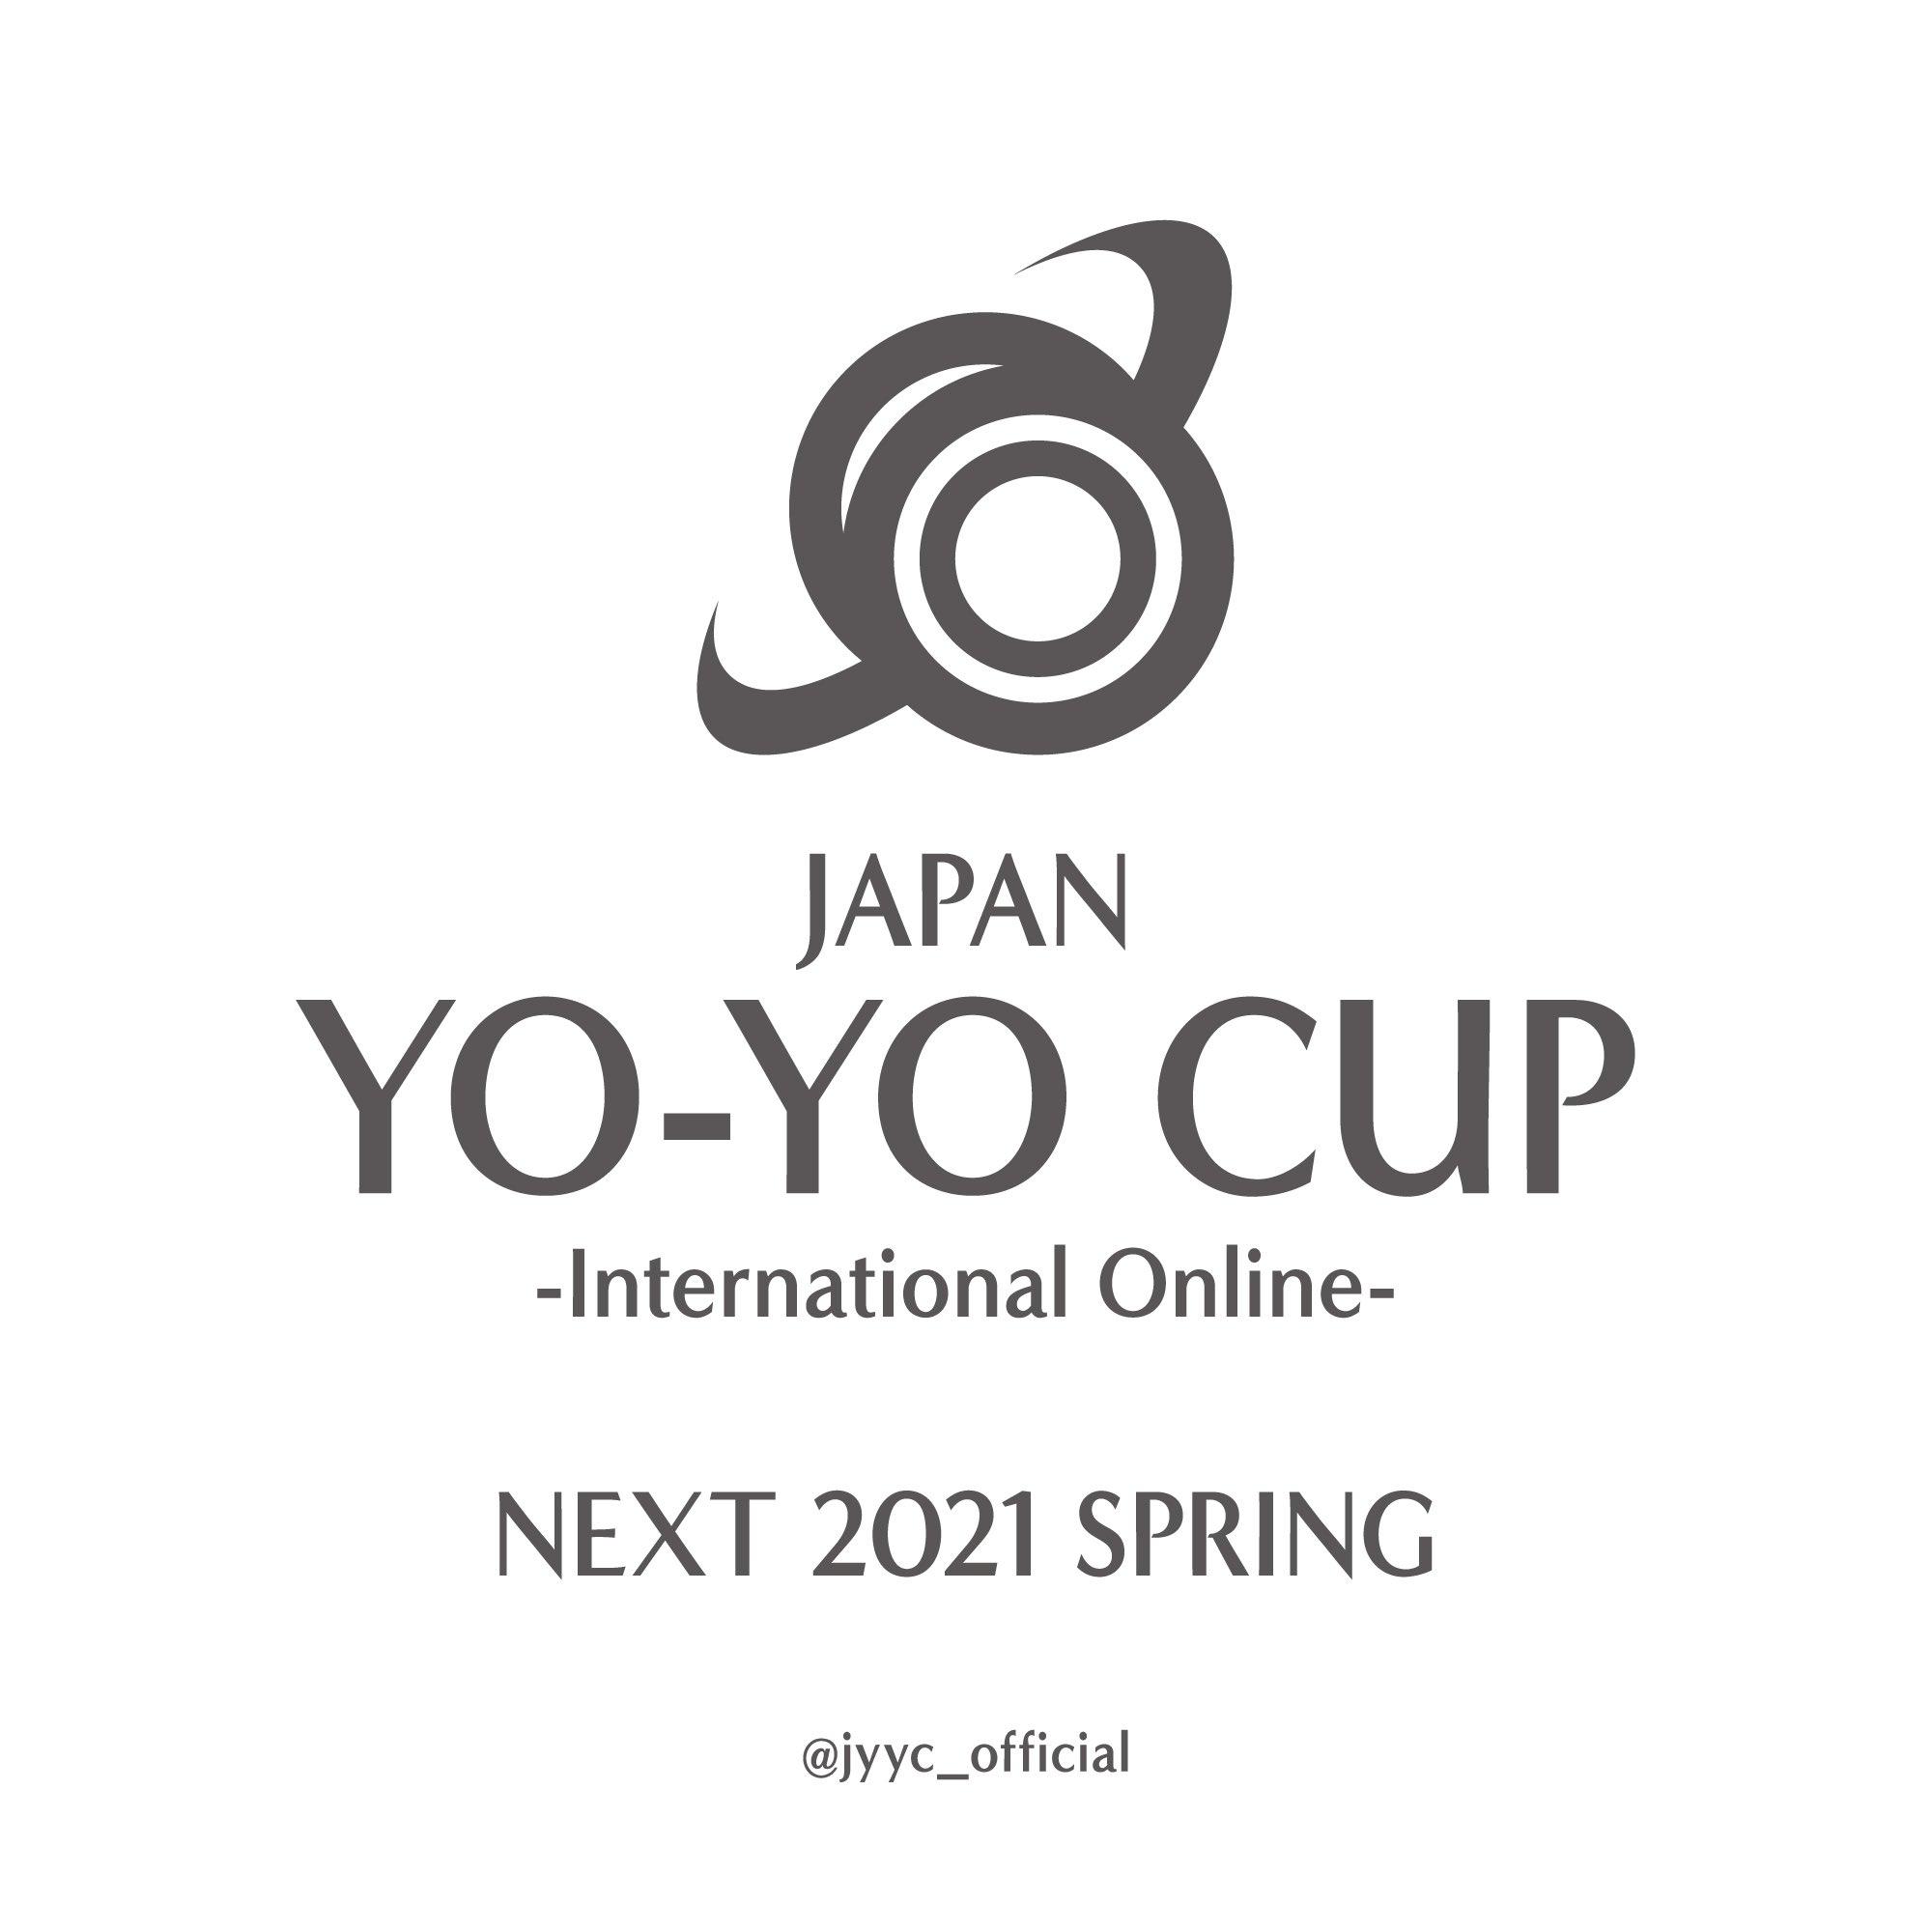 JAPAN YO-YO CUP -International Online- #JYYCIO《NEXT 2021 SPRING…》